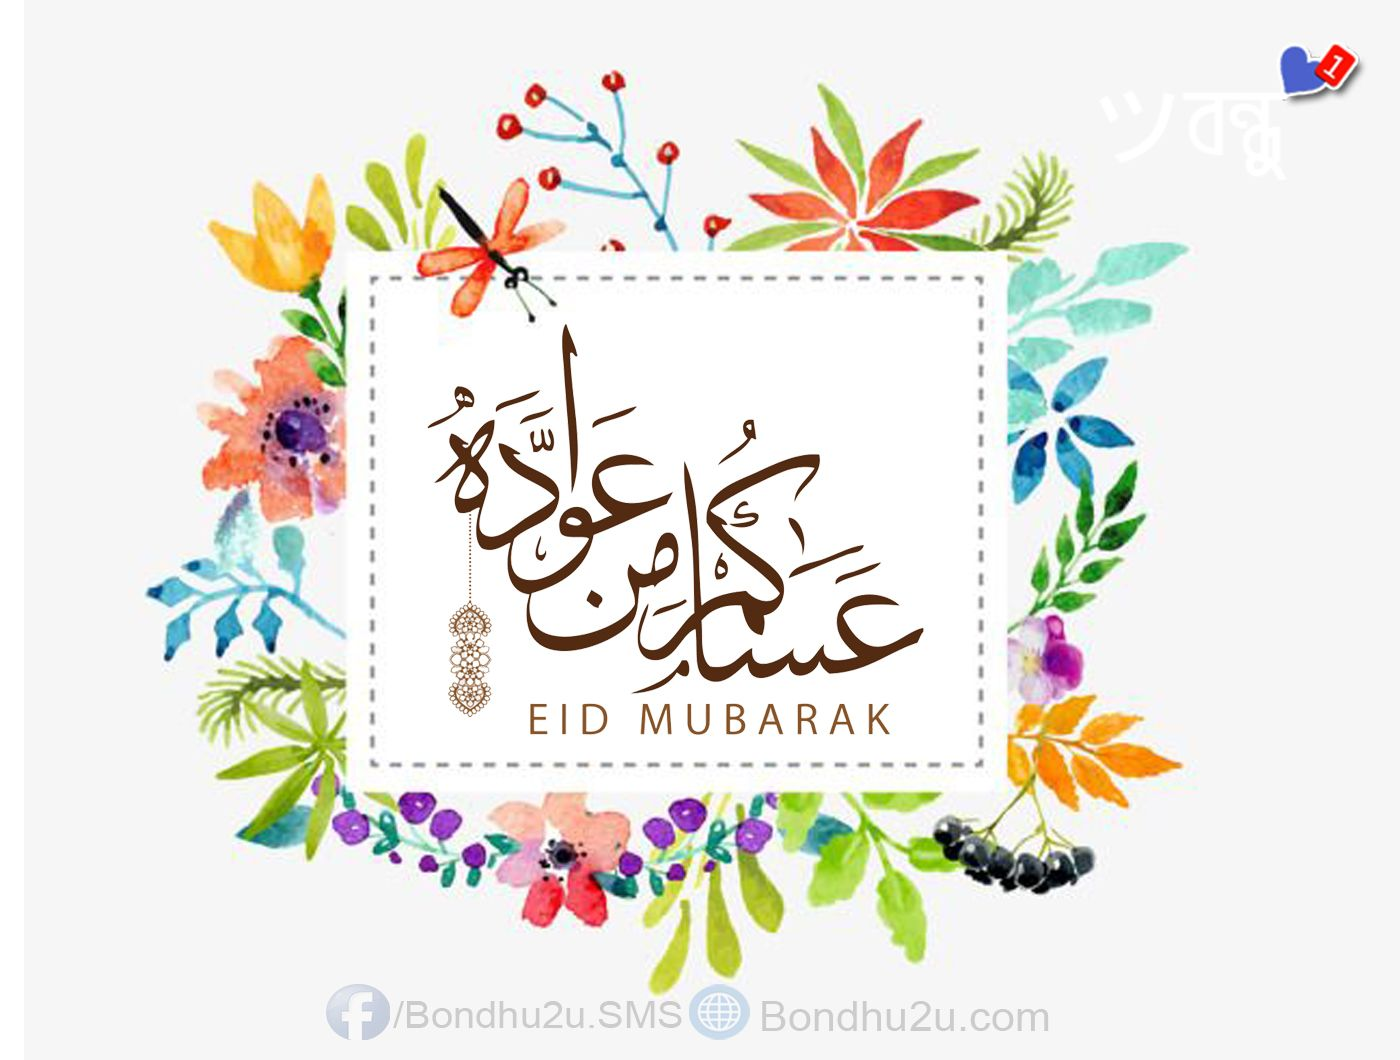 Eid Mubarak Sms Shayari Eid Mubarak Wishes Eid Mubarak Happy Chocolate Day